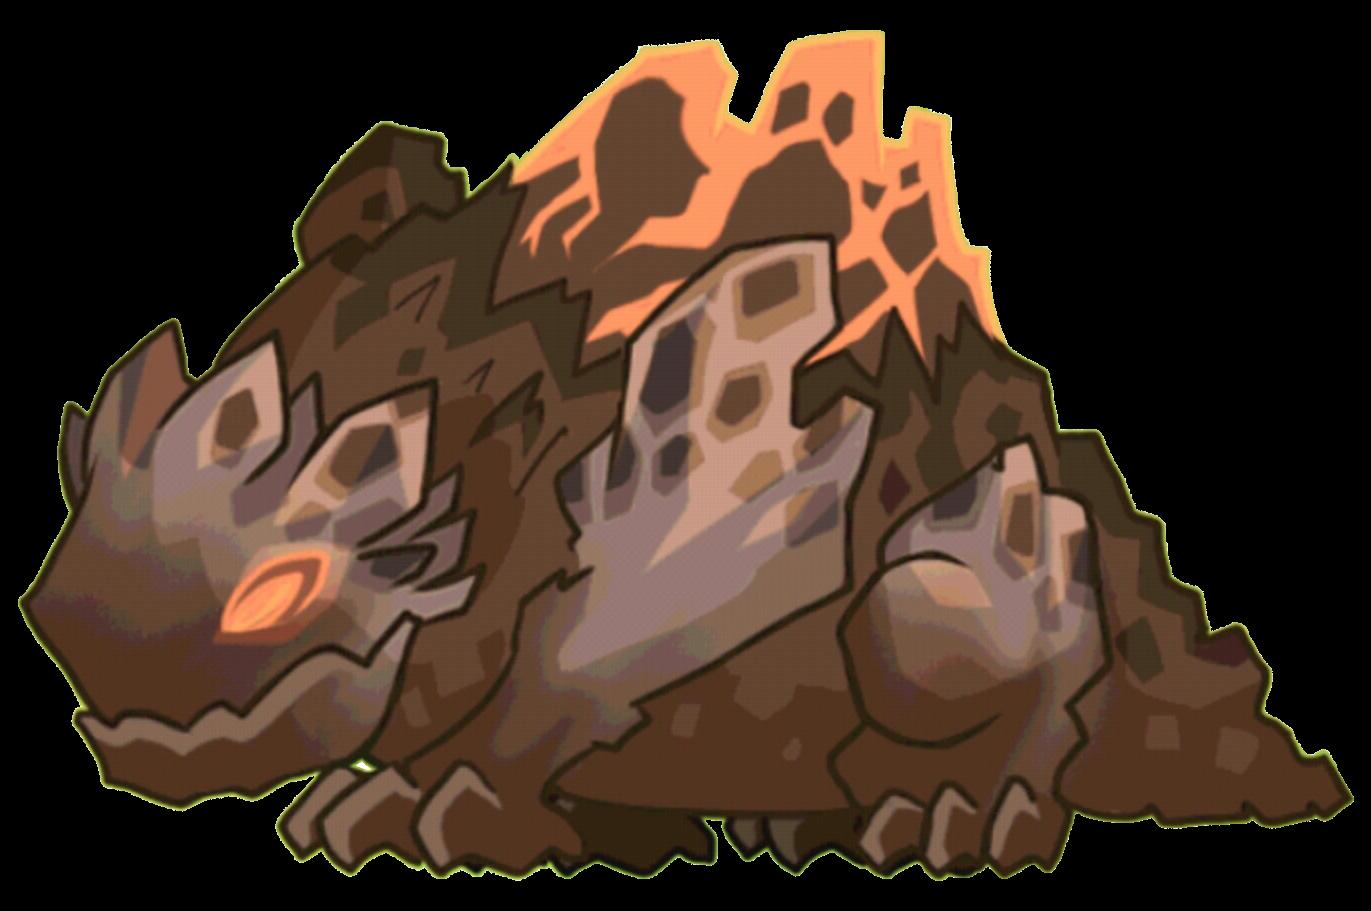 Super volcano dragon evolution. Clipart rock volcanic rock